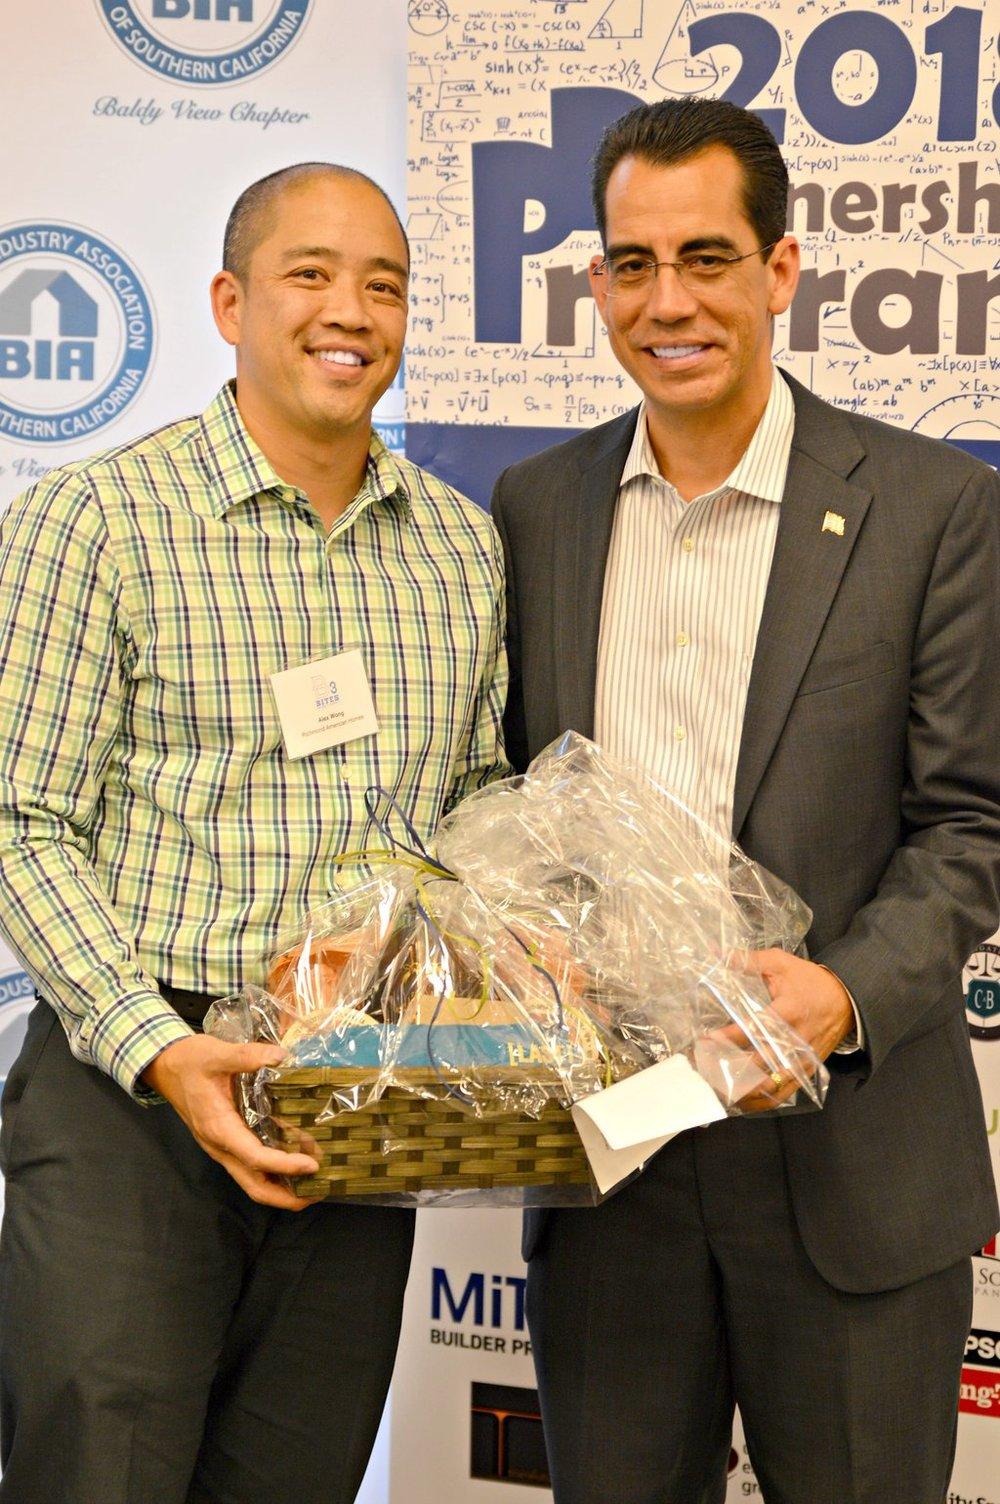 <b>ALEX WONG</b><br>Richmond American Homes<br>Last Name Brewing Basket